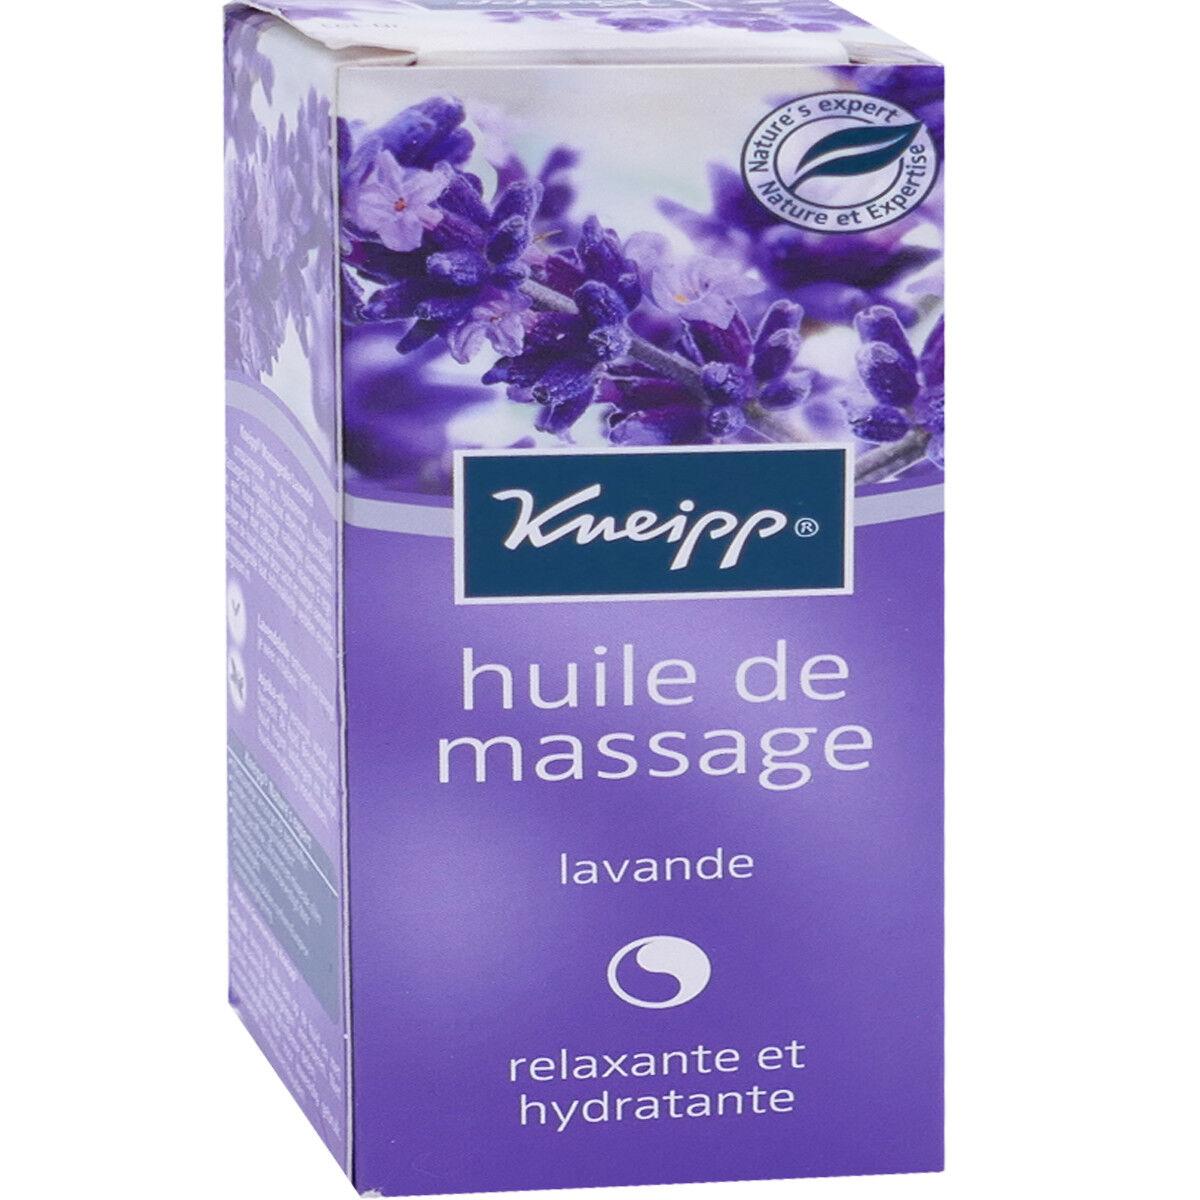 Kneipp huile de massage  lavande 100 ml relaxante